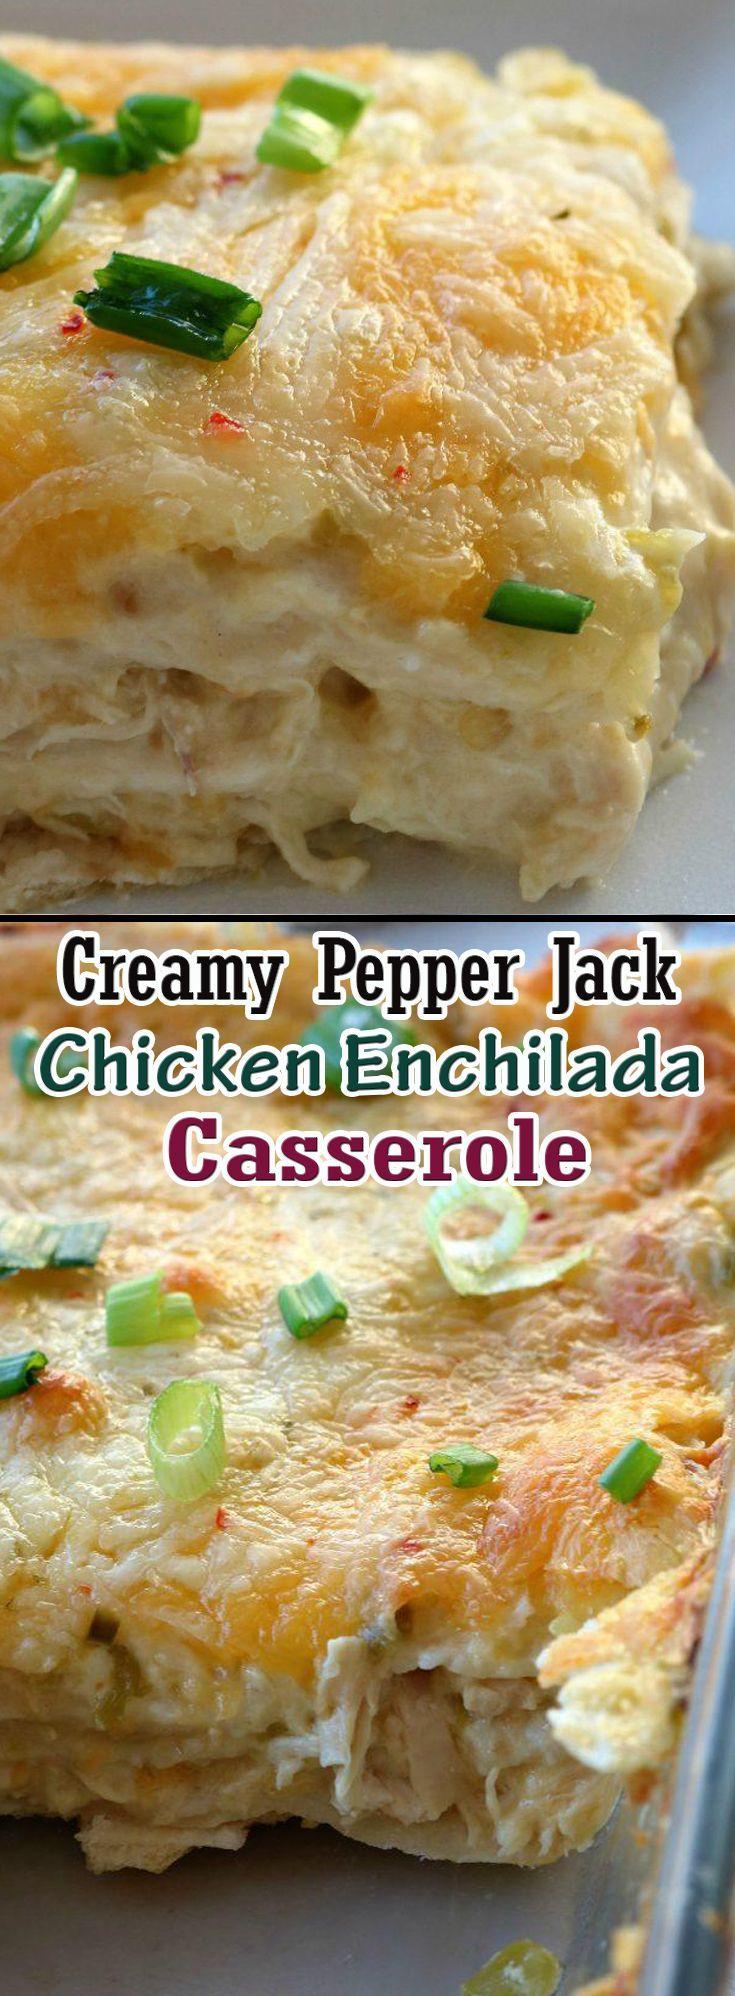 Creamy Pepper Jack Chicken Enchilada Casserole